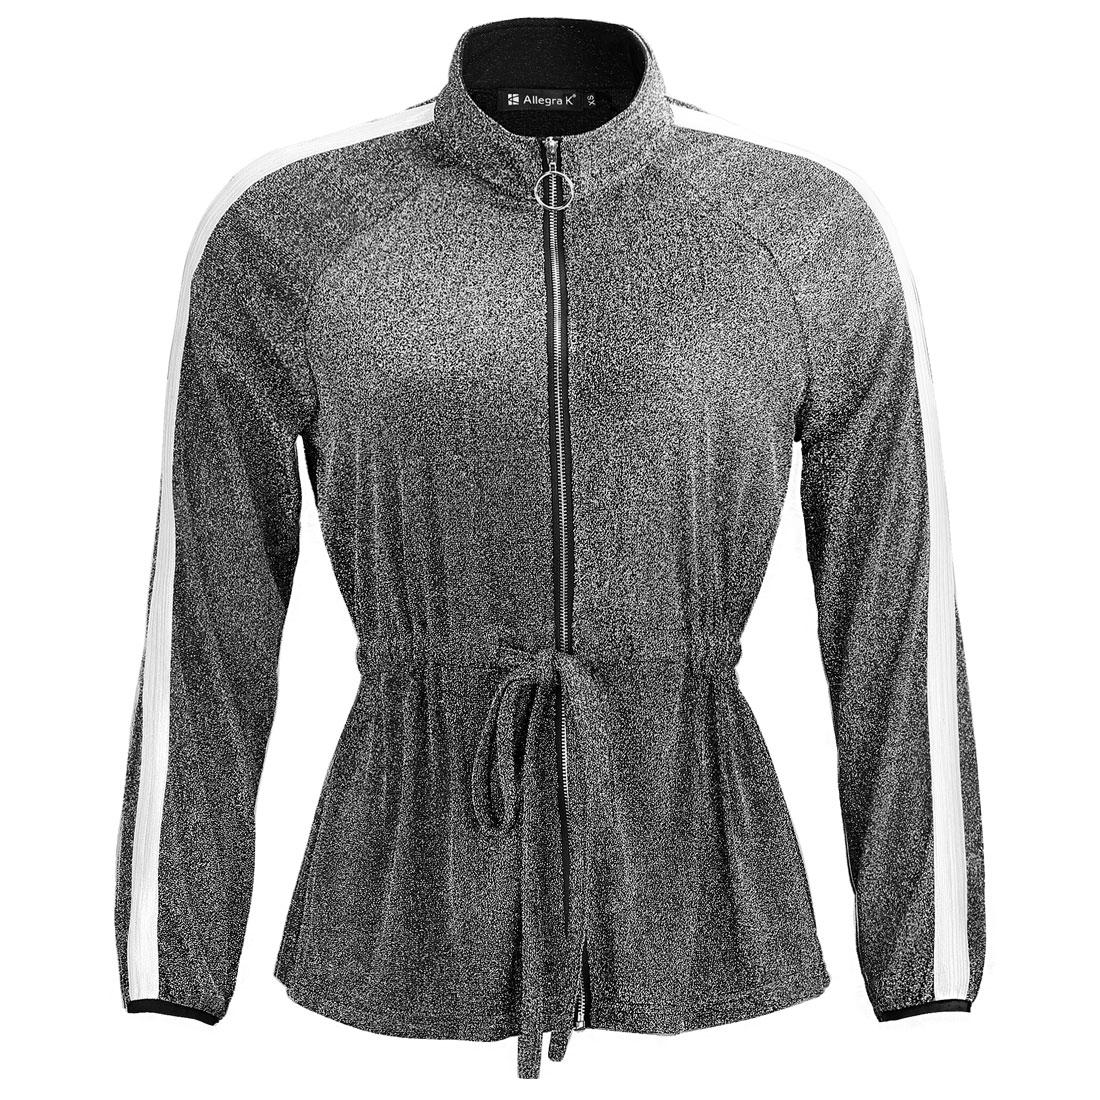 Women's Glitter Lightweight Zip Waist Drawstring Jacket Black S (US 6)